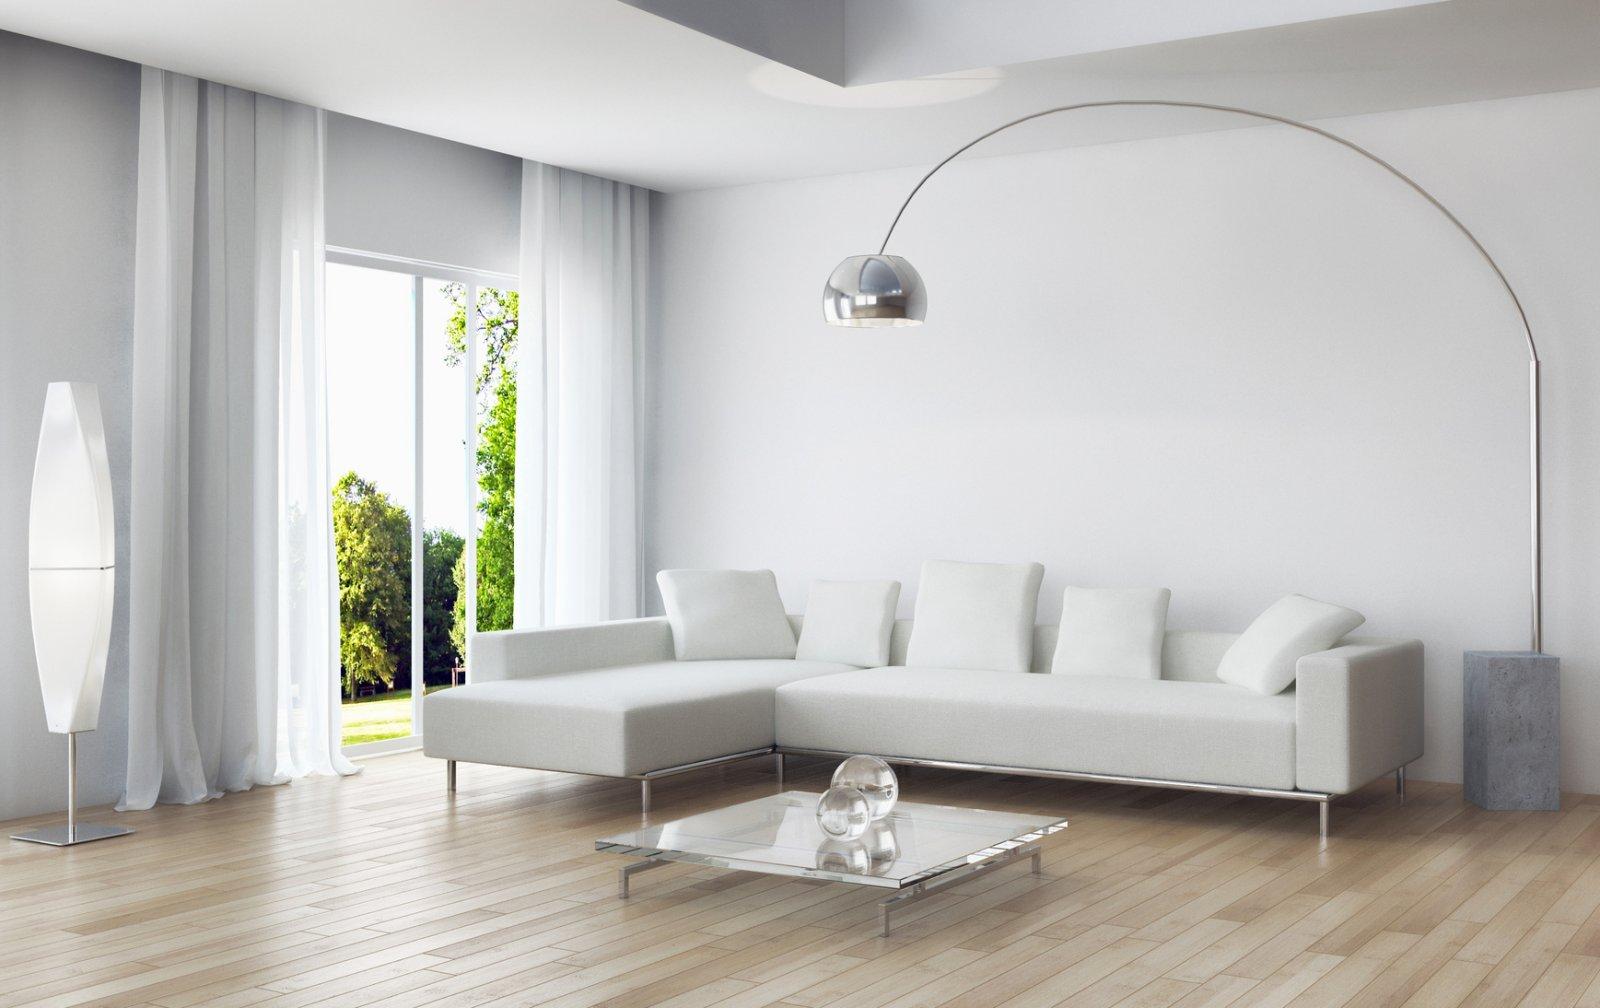 Soggiorno Ikea Usato : Lampada ikea usata soggiorno rustico ikea sedie soggiorno ikea